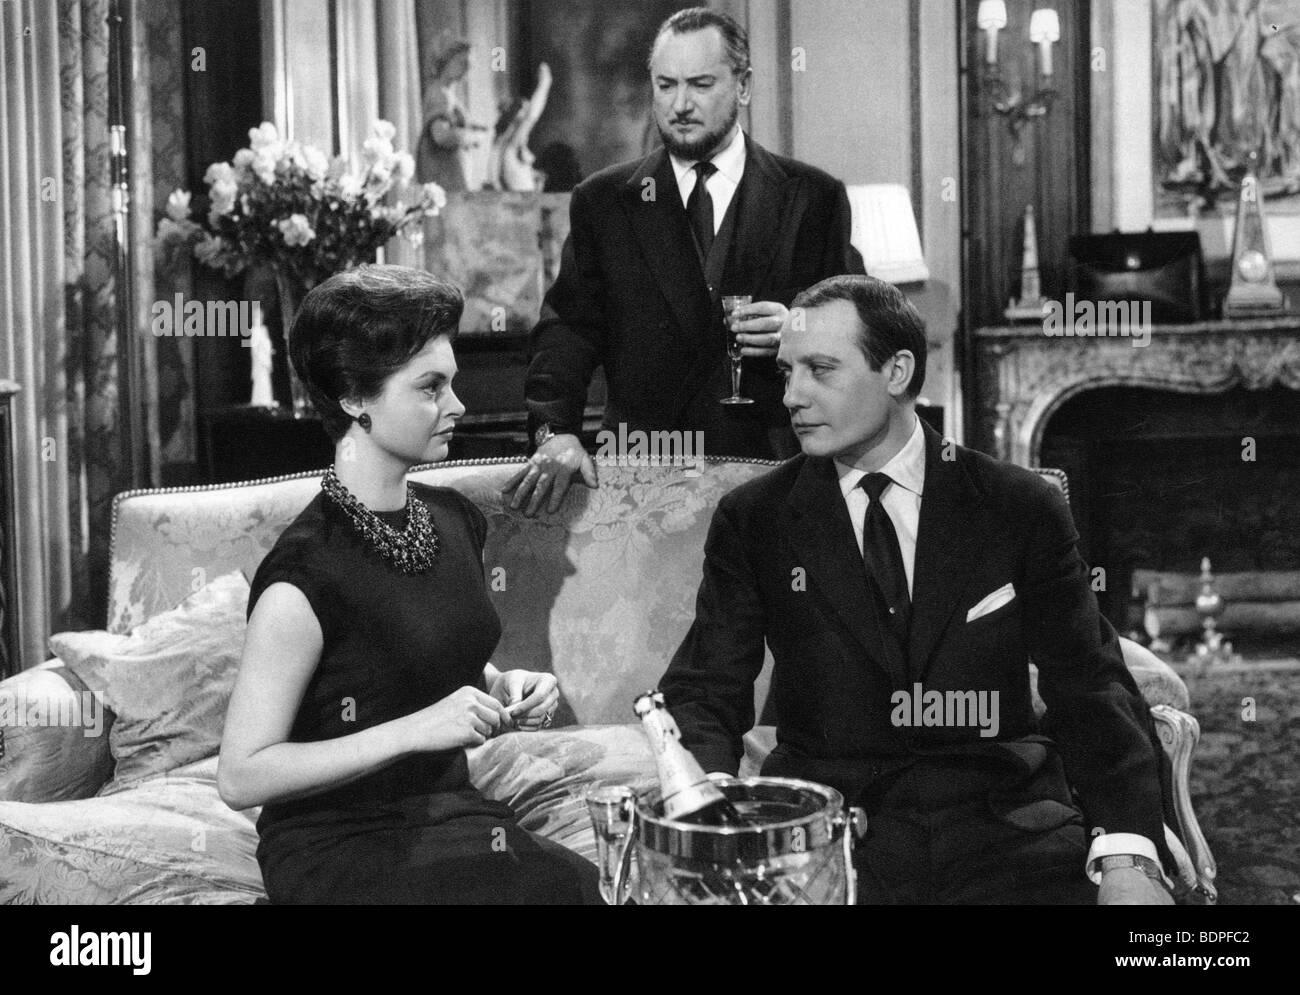 L'affaire Nina B. Year: 1961 Director: Robert Siodmak Nadja Tiller, Jacques Dacqmine, Pierre Brasseur - Stock Image